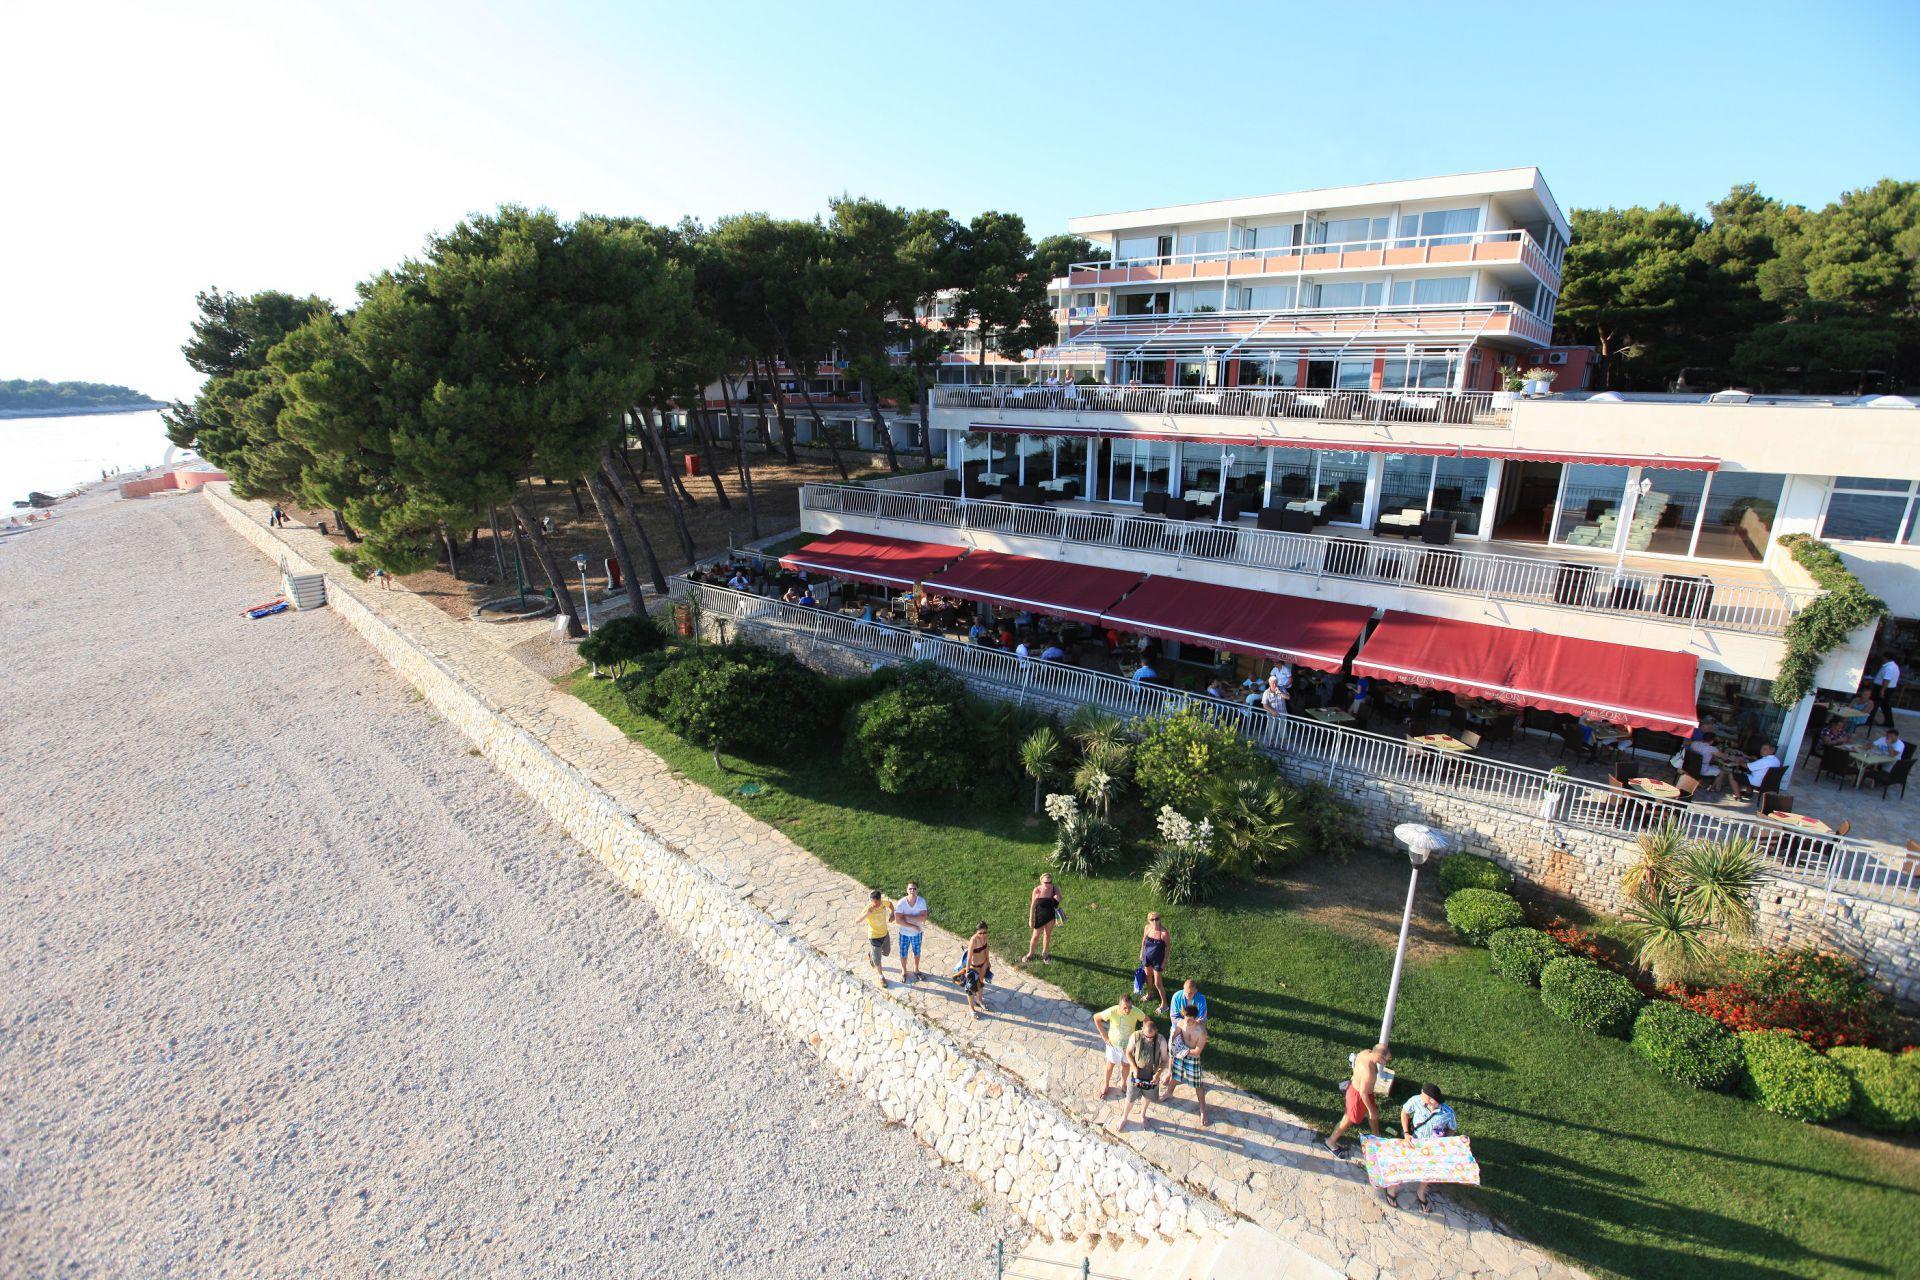 hotel 11 14825496075 o - Zora Hotel